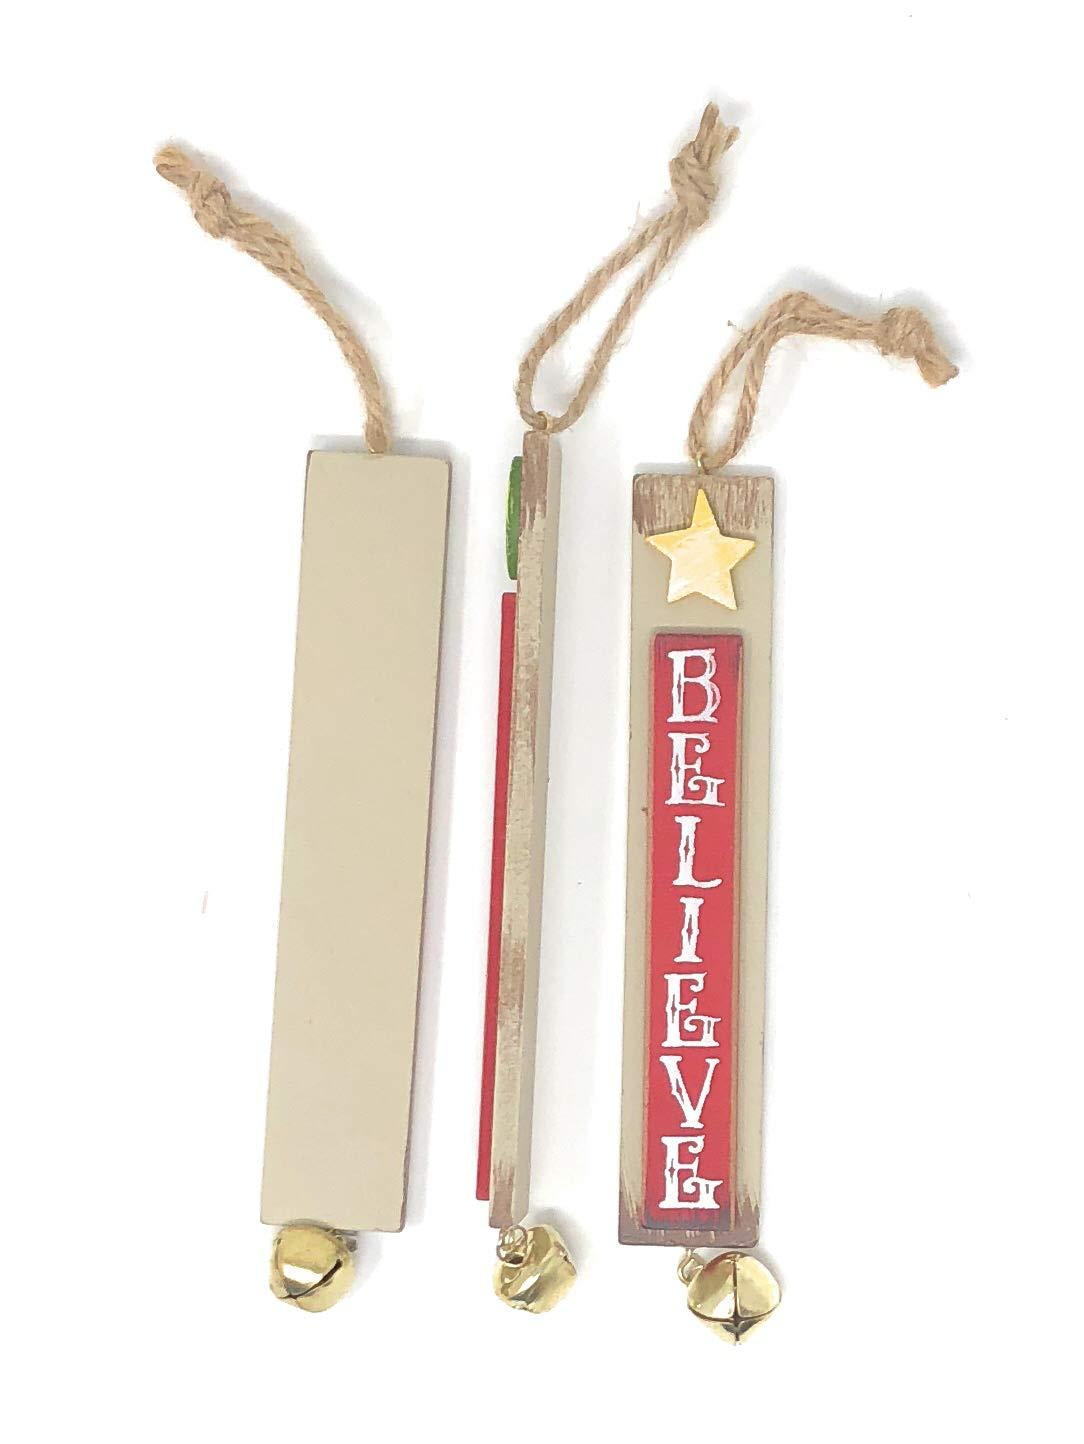 Hannas Handiworks Jingle Bell Christmas Ornaments Long Wooden Hanging Ornaments Set of 3